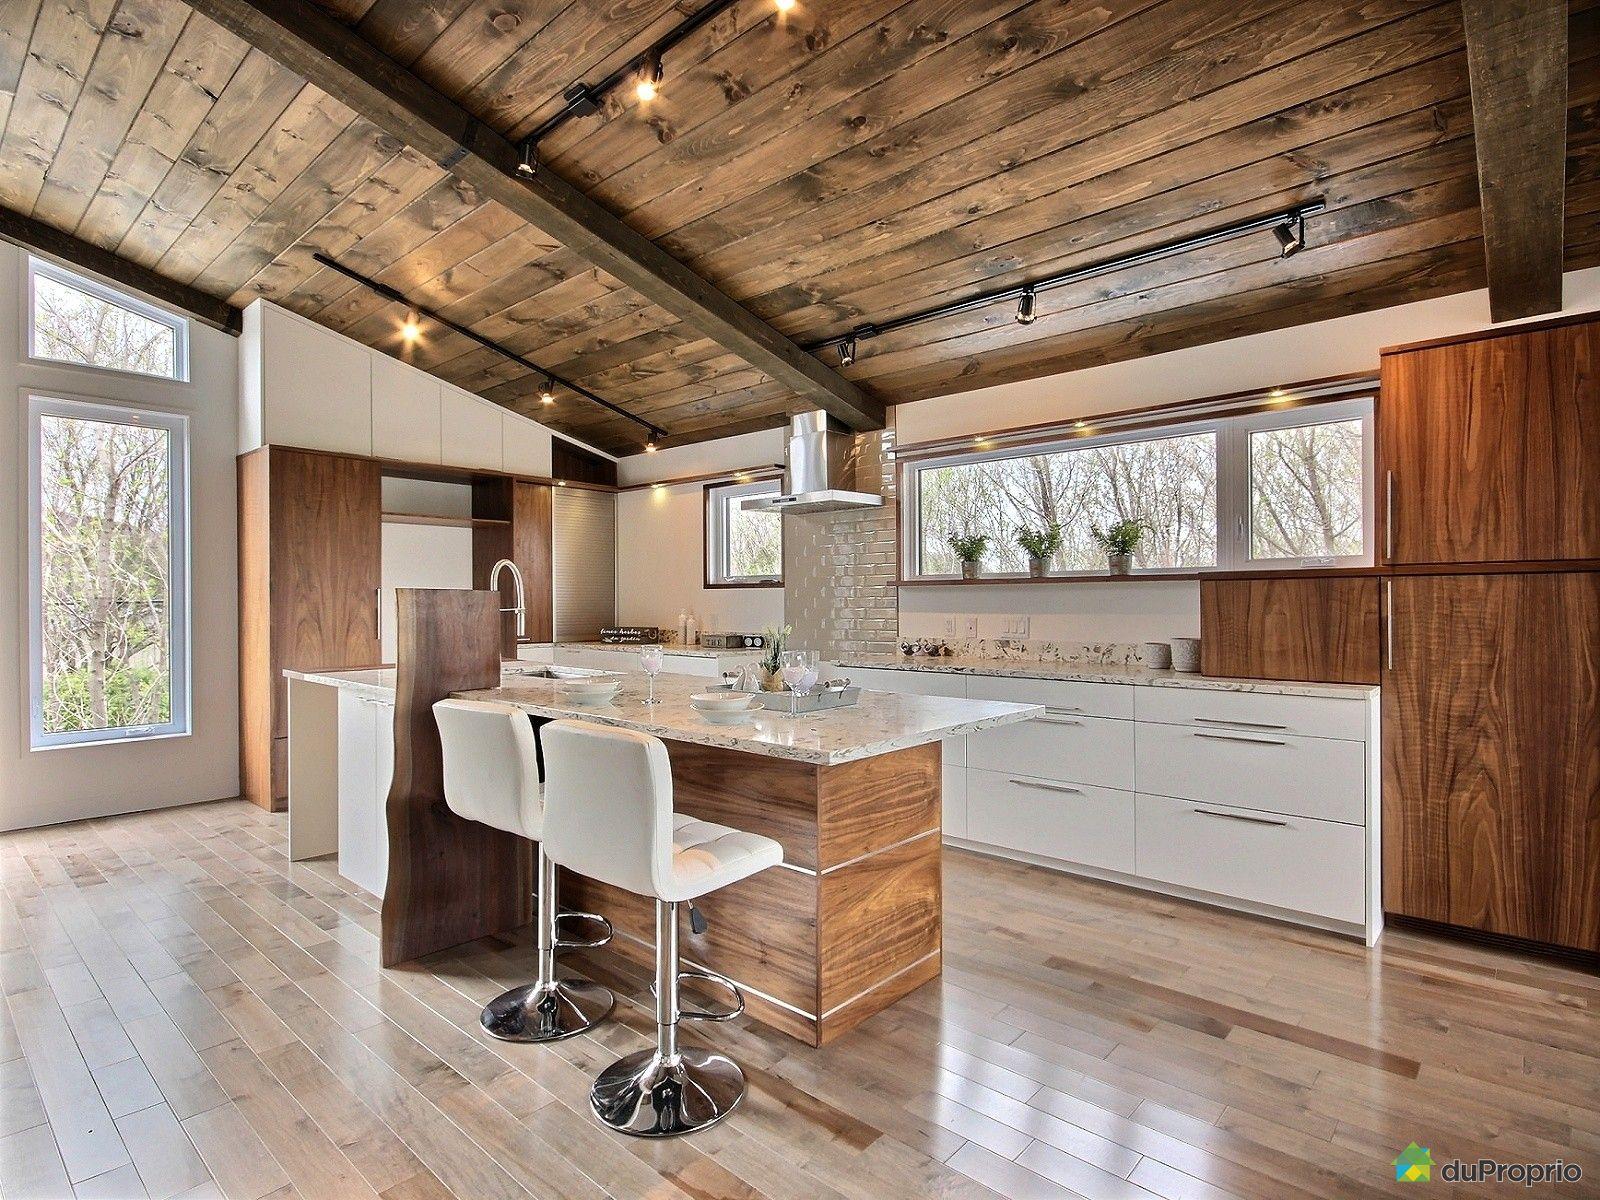 maison neuve vendre bromont 122 rue du saguenay immobilier qu bec duproprio 701308. Black Bedroom Furniture Sets. Home Design Ideas